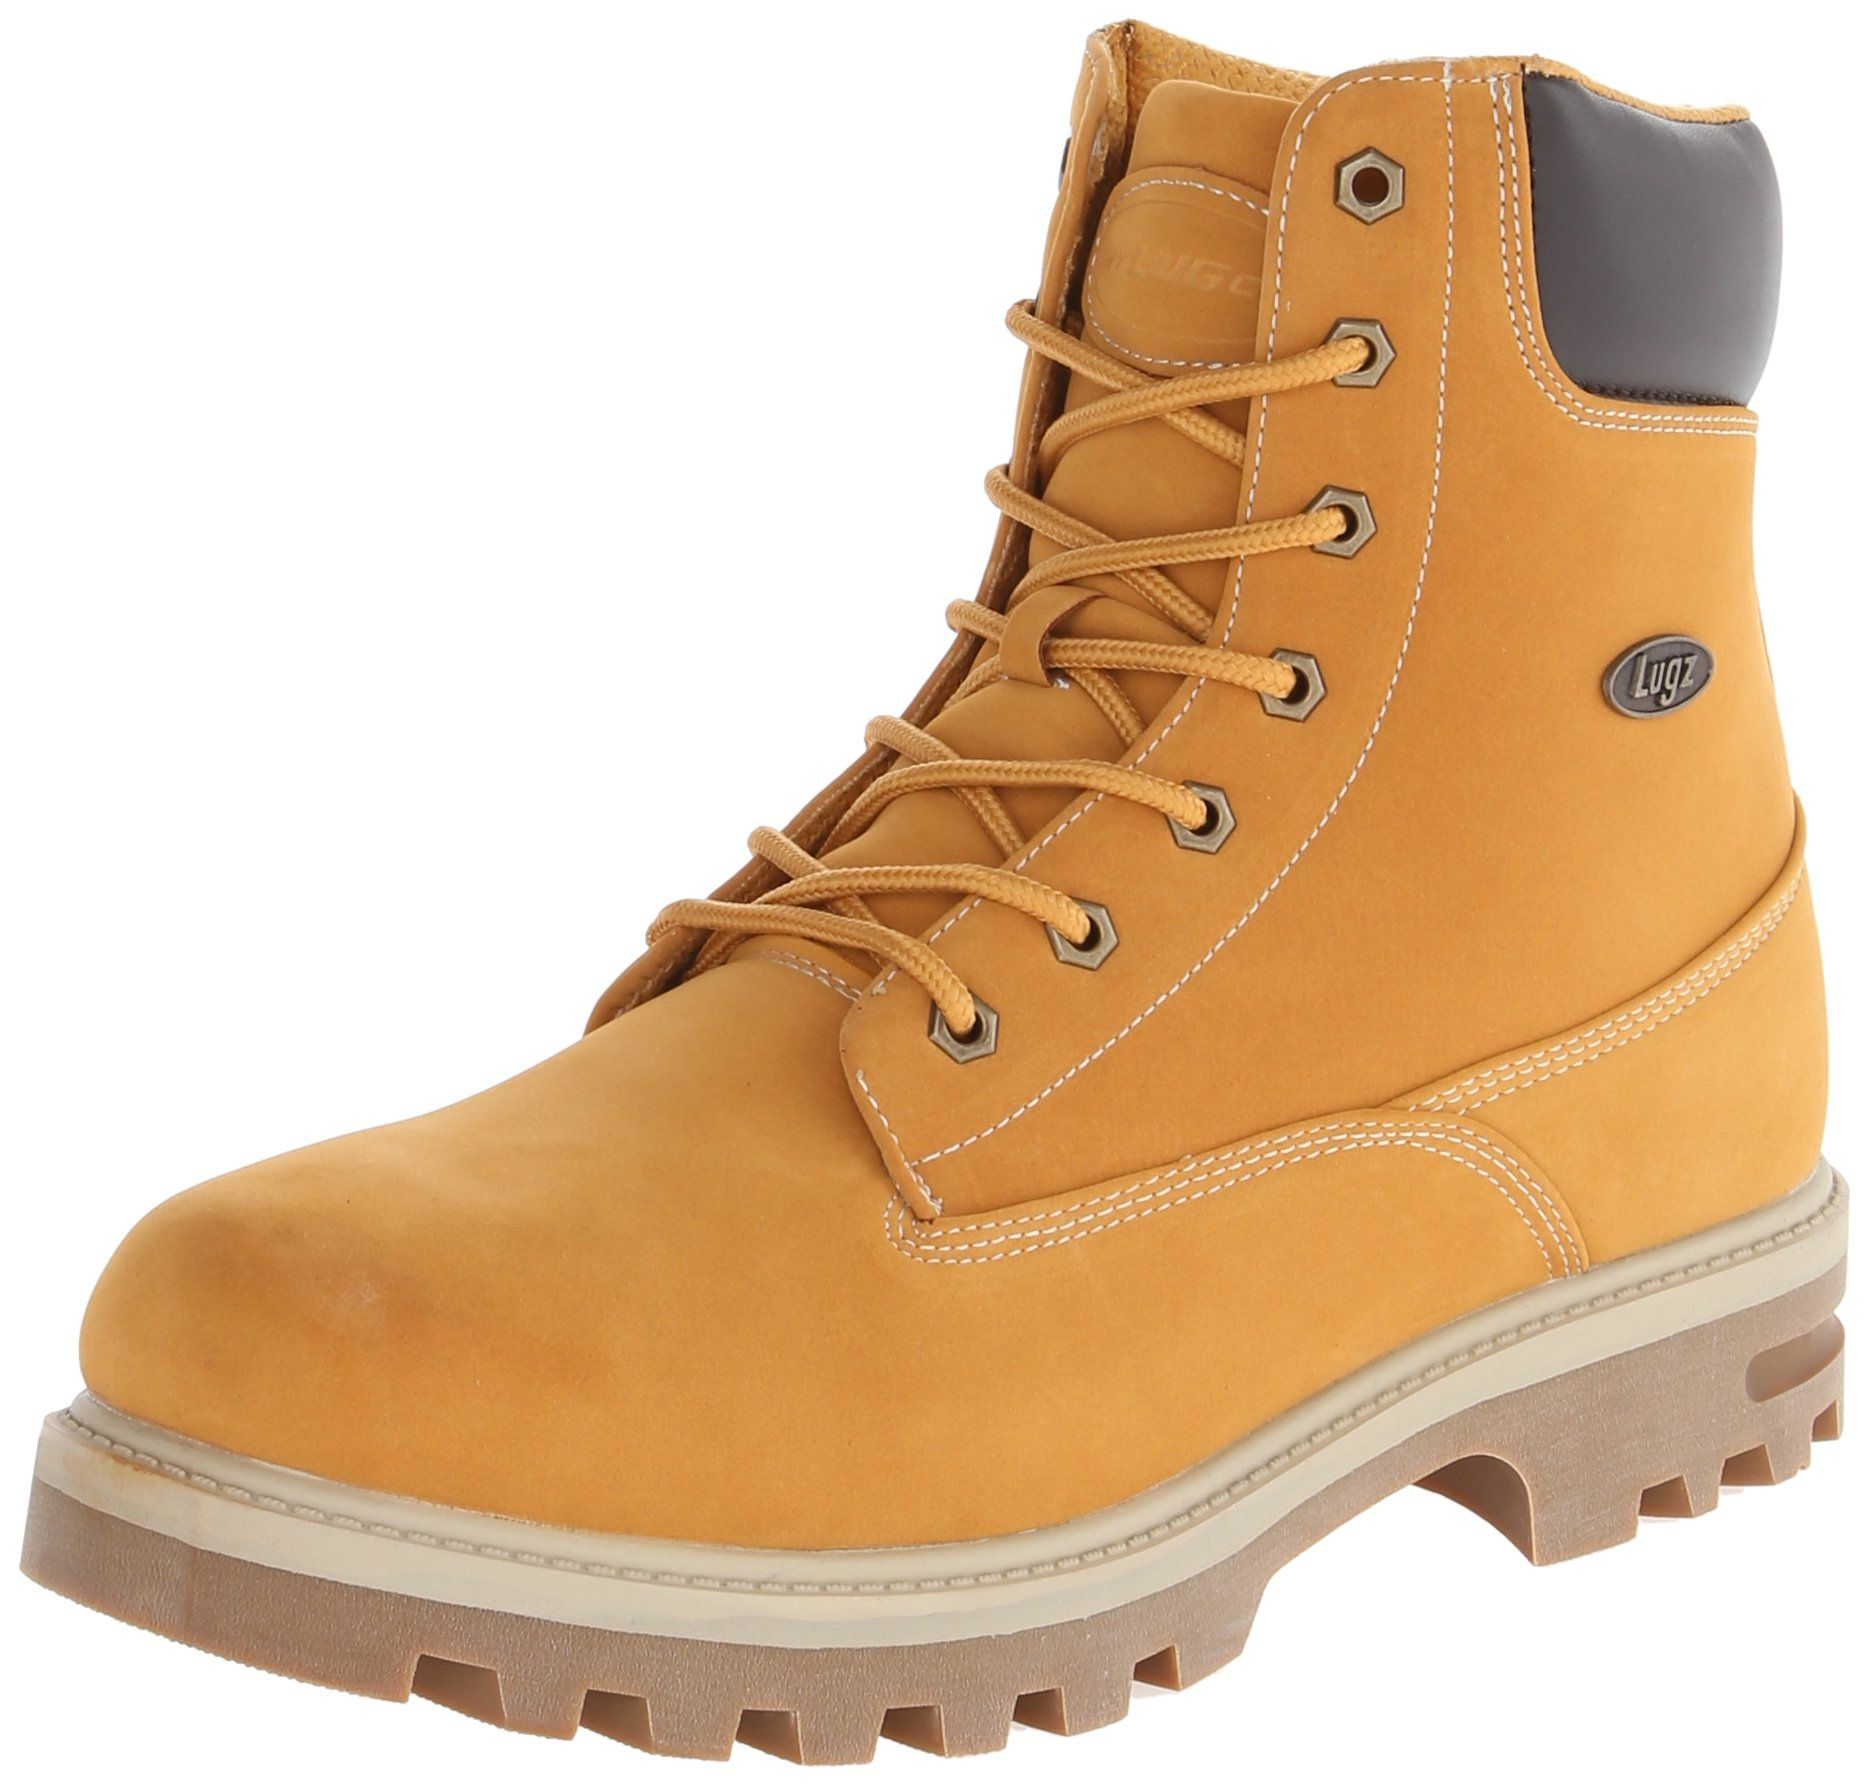 Lugz Mens Empire Hi WR Thermabuck Boot Golden Wheat/Bark/Cream/Gum 8.5